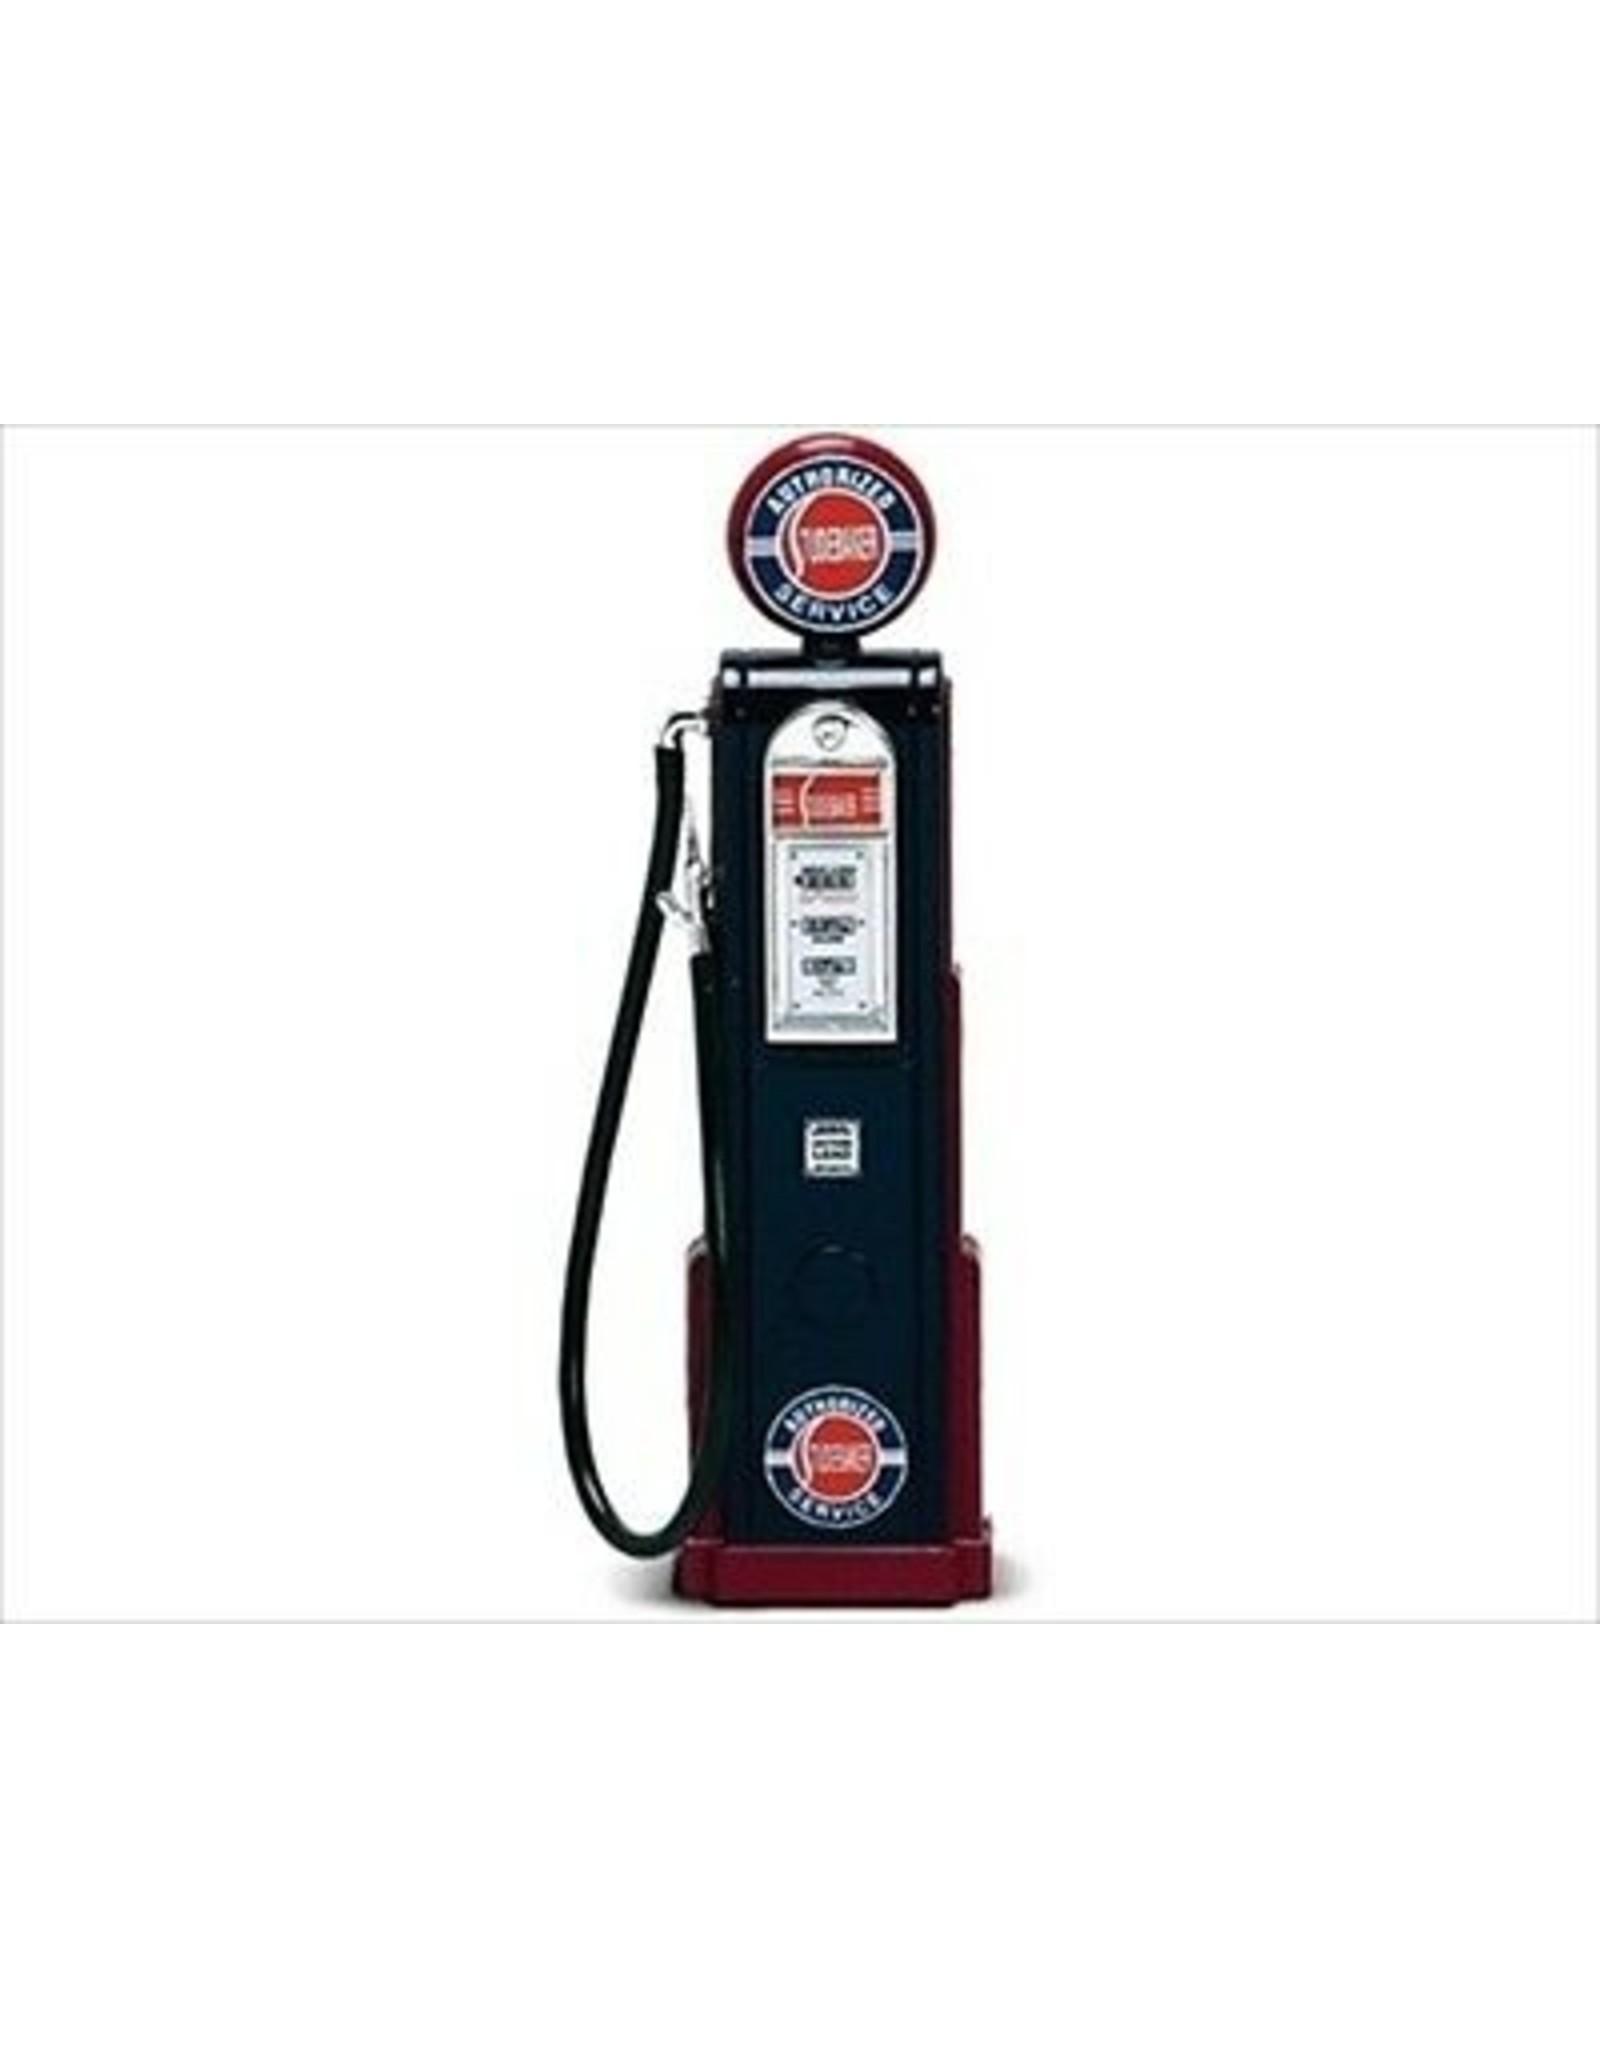 Gas Pump Replica 'Studebaker' - 1:18 - Road Signature